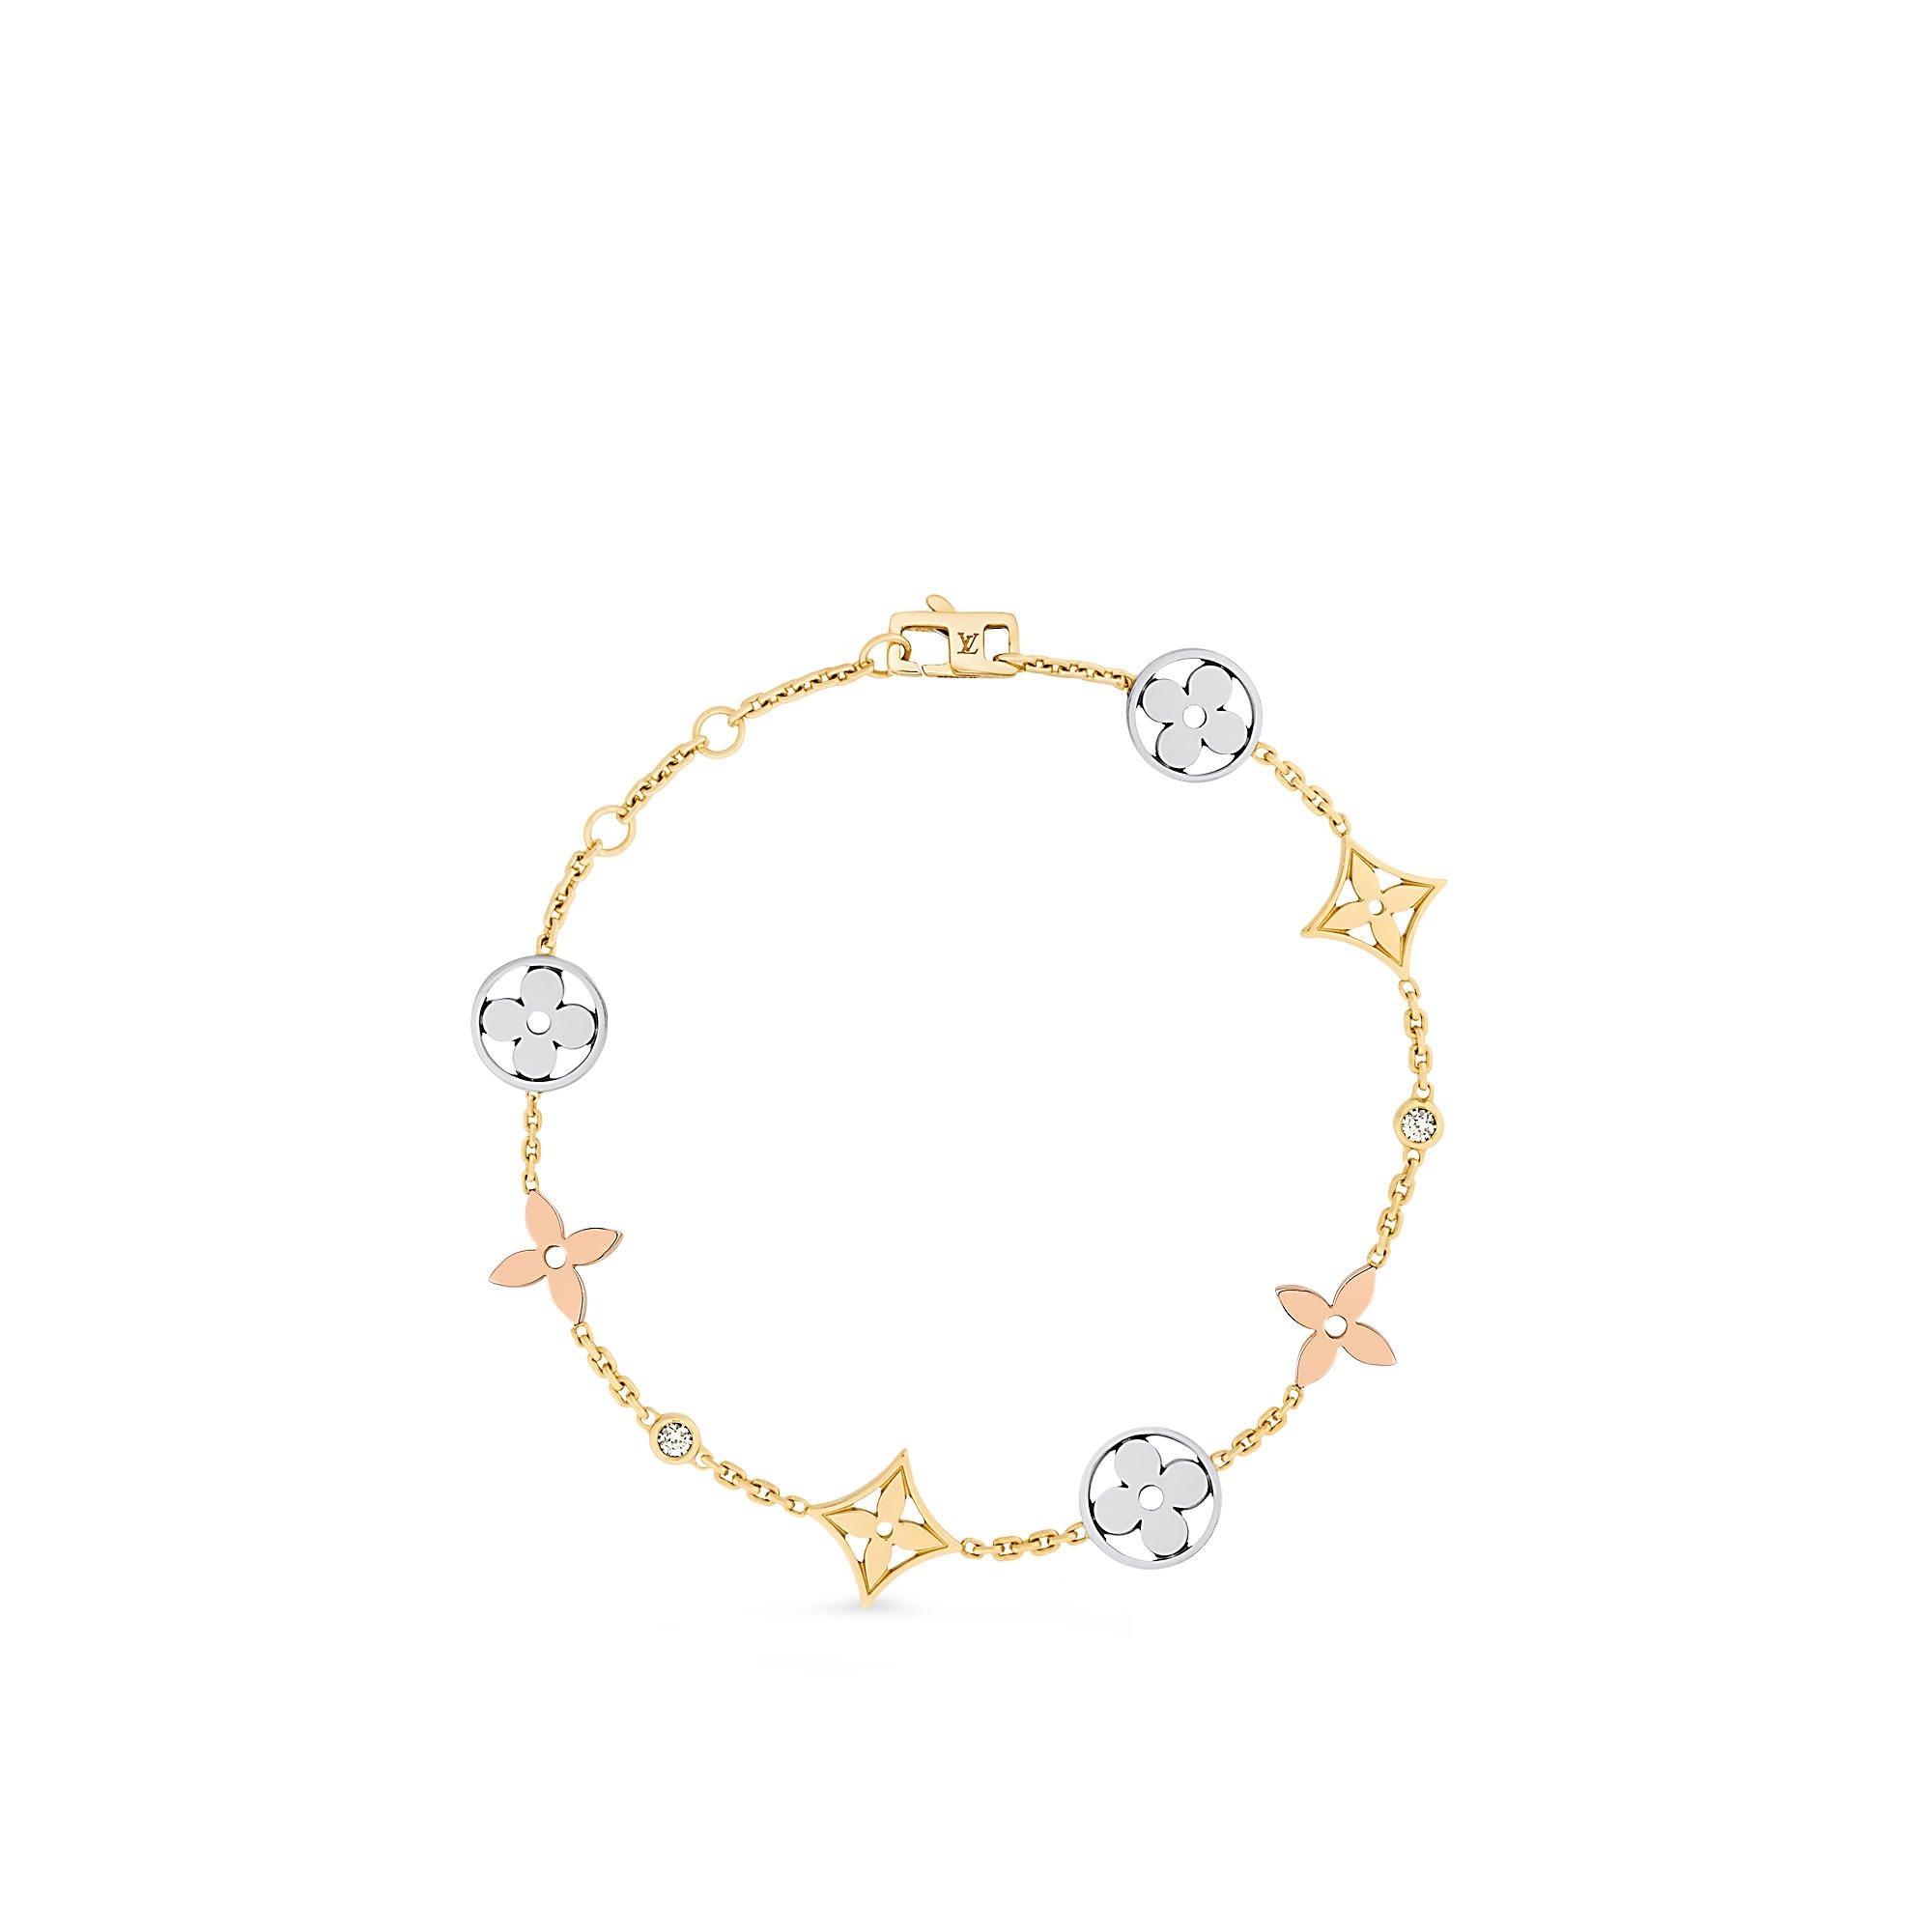 aaddbf339944 good louis vuitton bracelet mode femme bijoux bijoux louis vuitton louis  vuitton monograme with bracelet mode